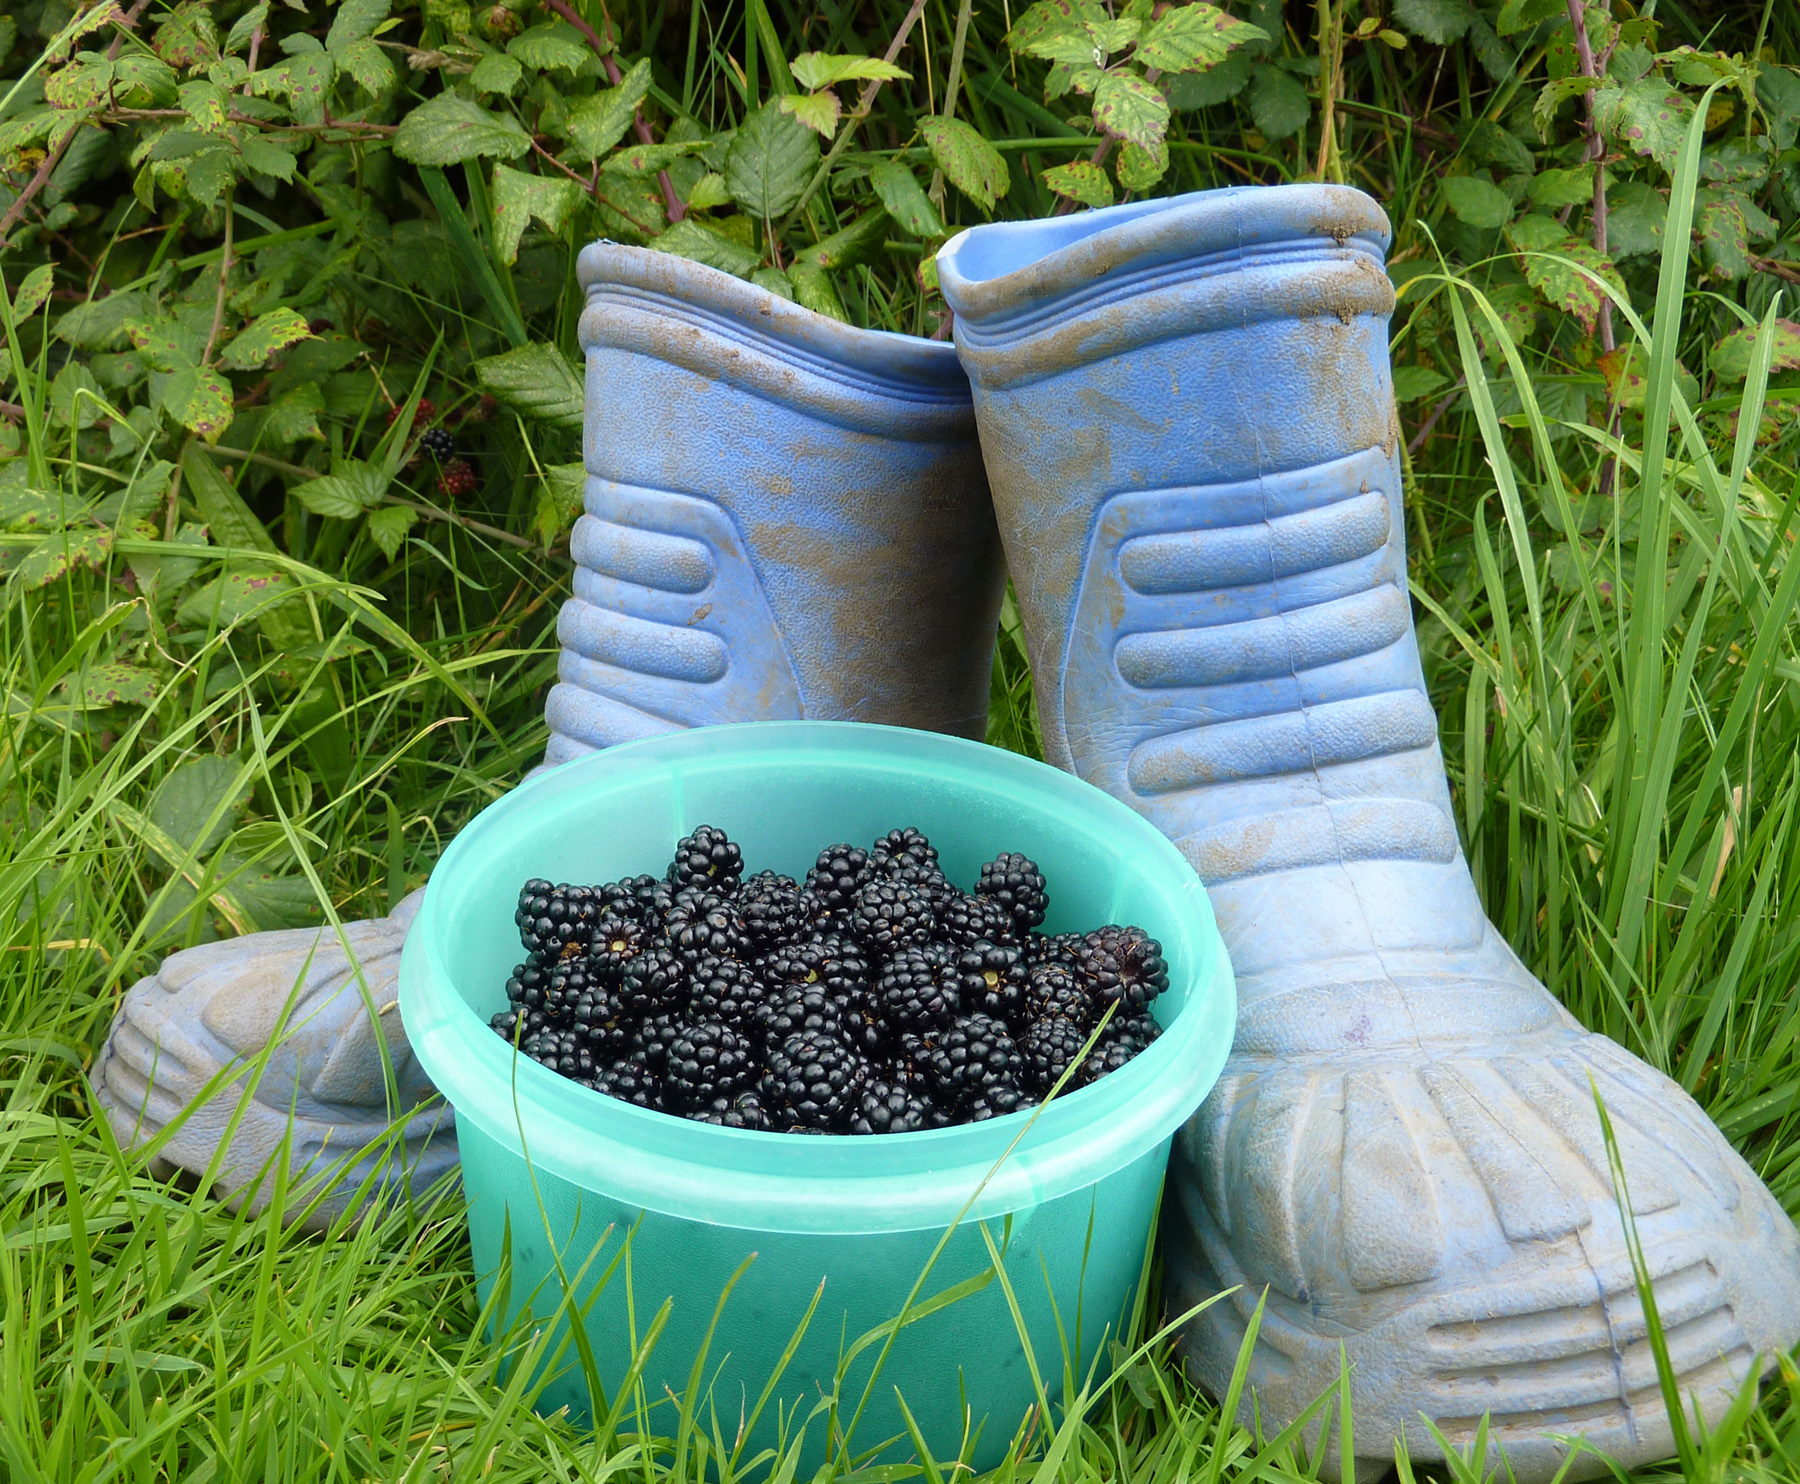 Hedgerow jelly_blackberries picked + wellies